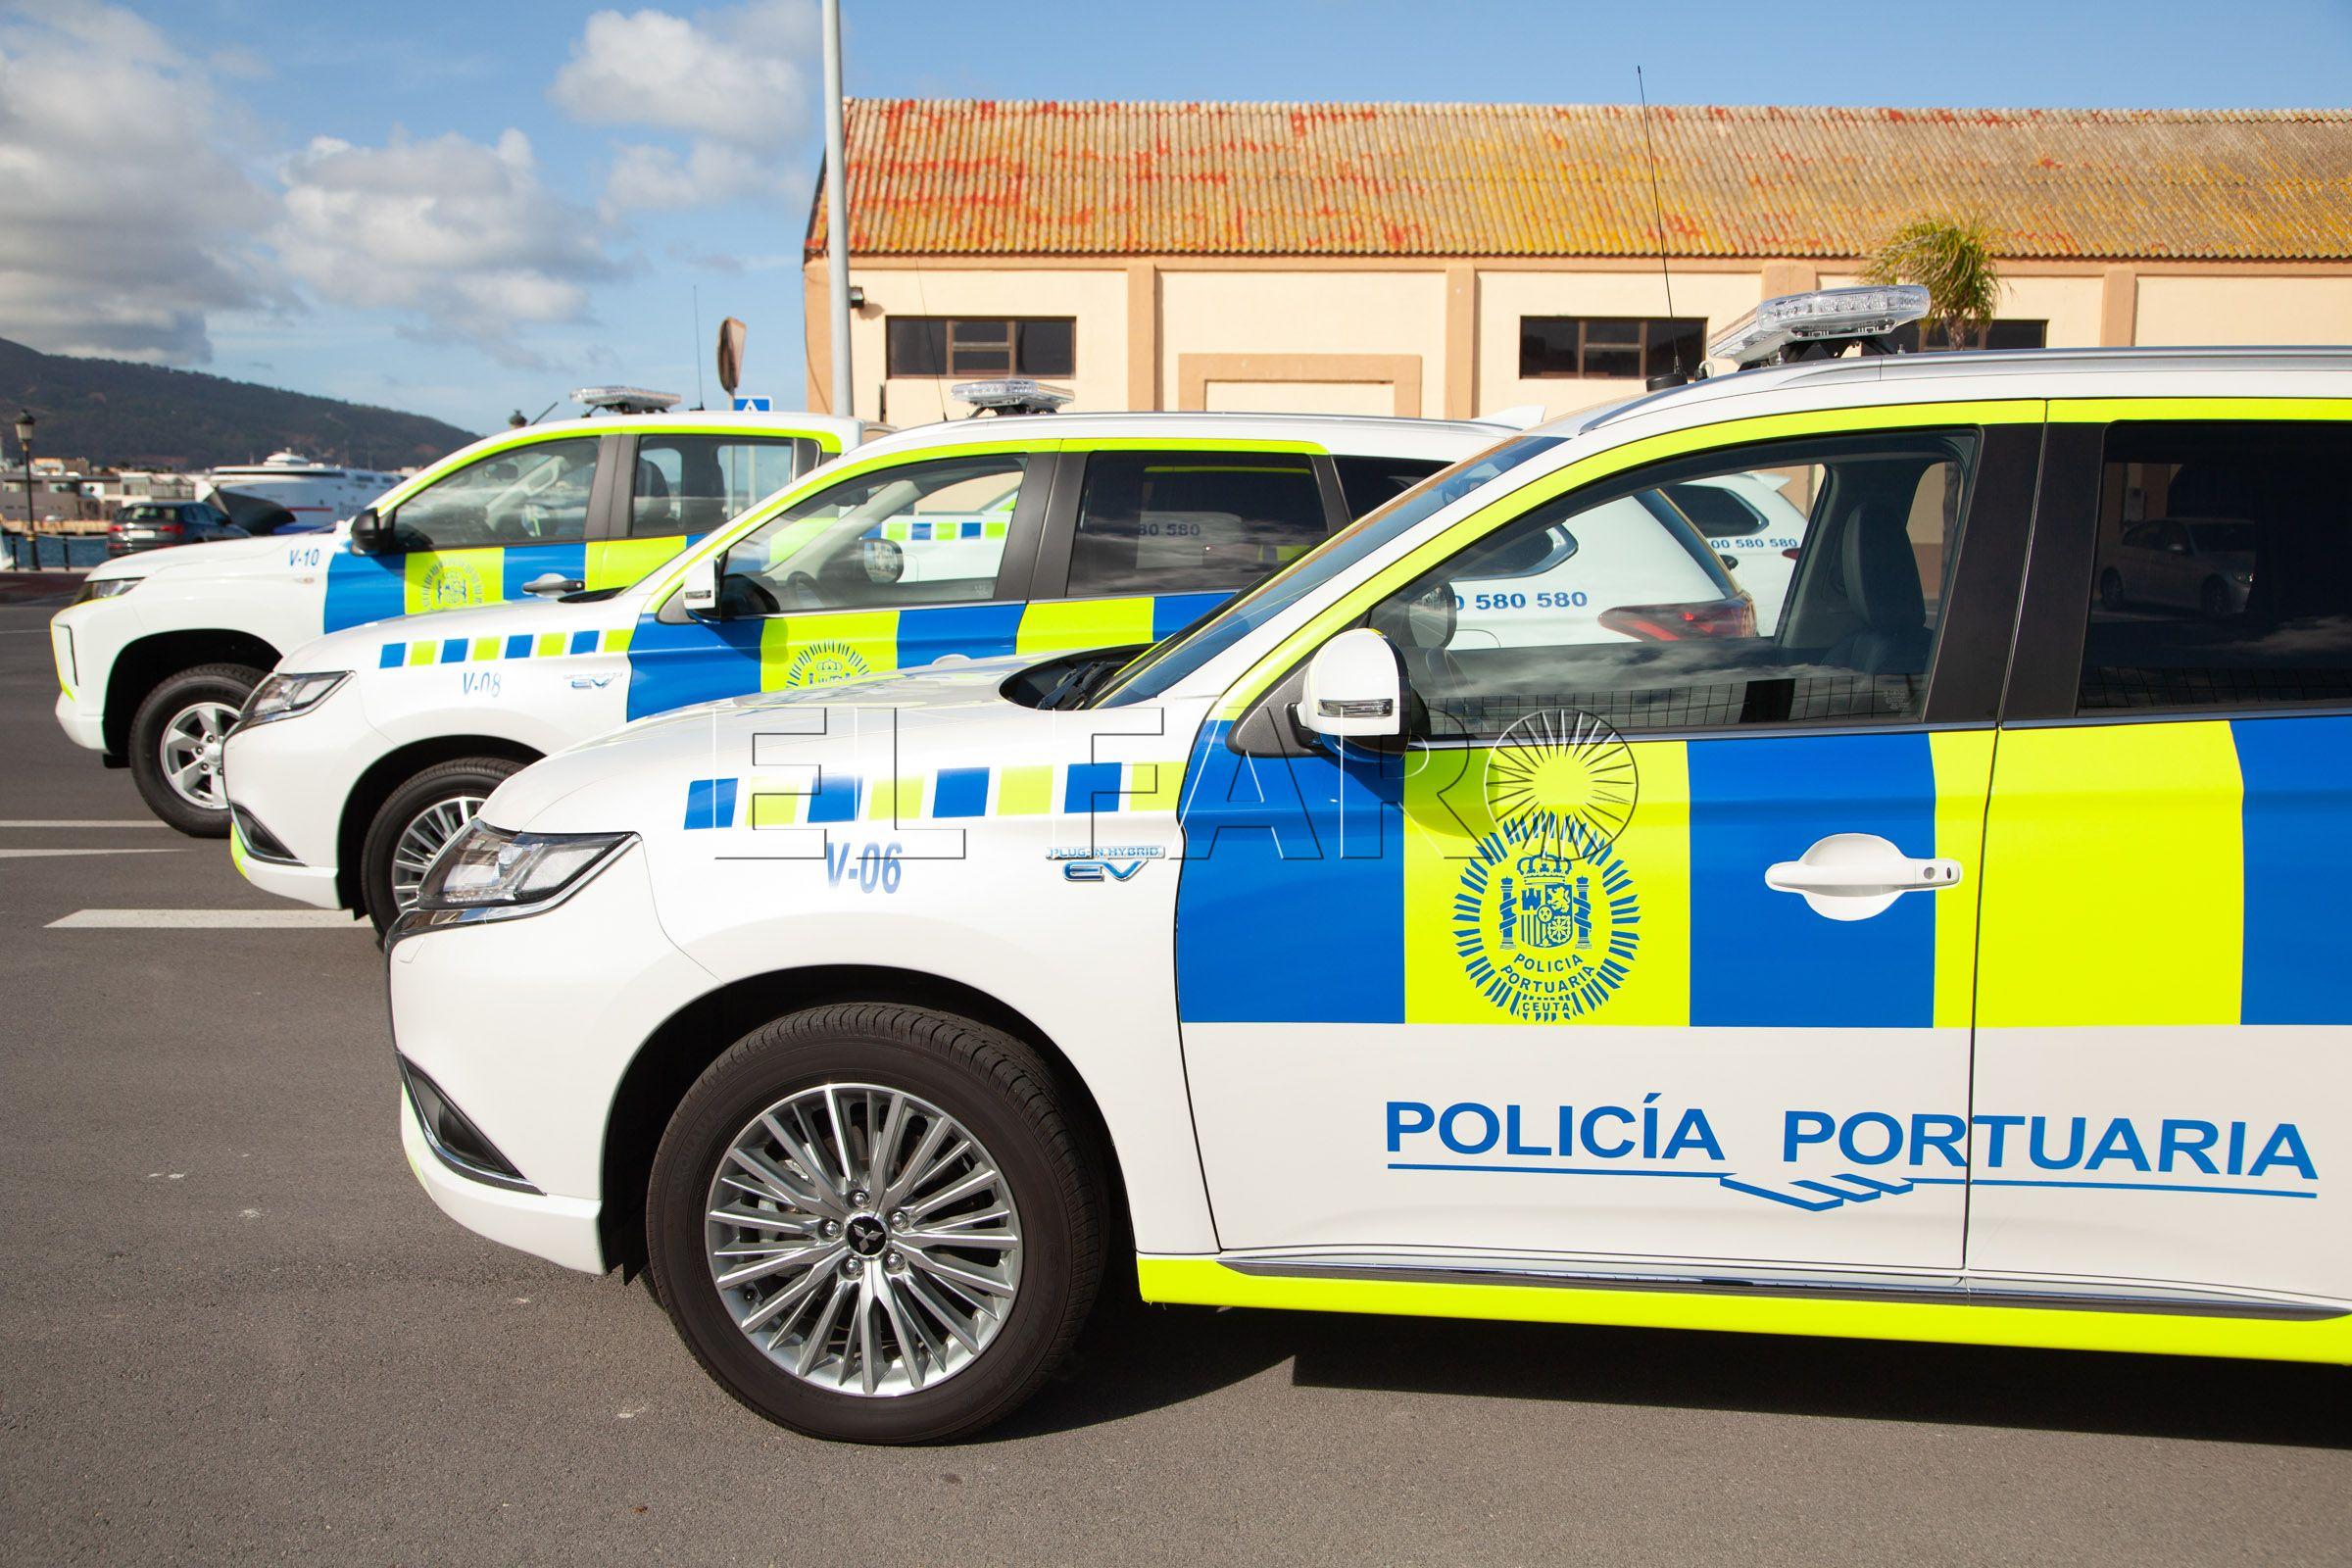 policia-portuaria-1